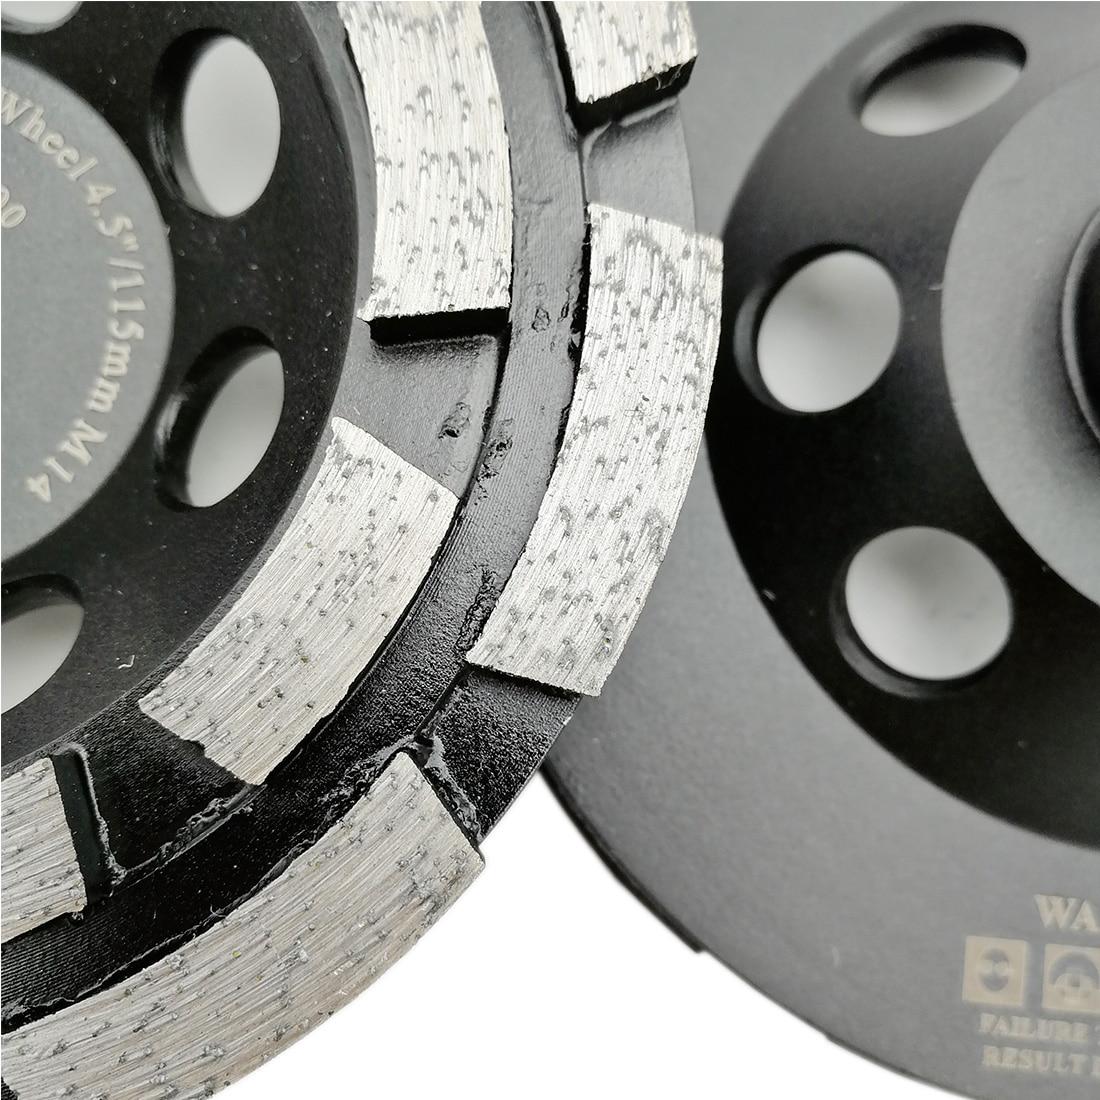 SHDIATOOL 1pc Diamond Double Row Grinding Cup Wheel for Concrete Masonry Granite